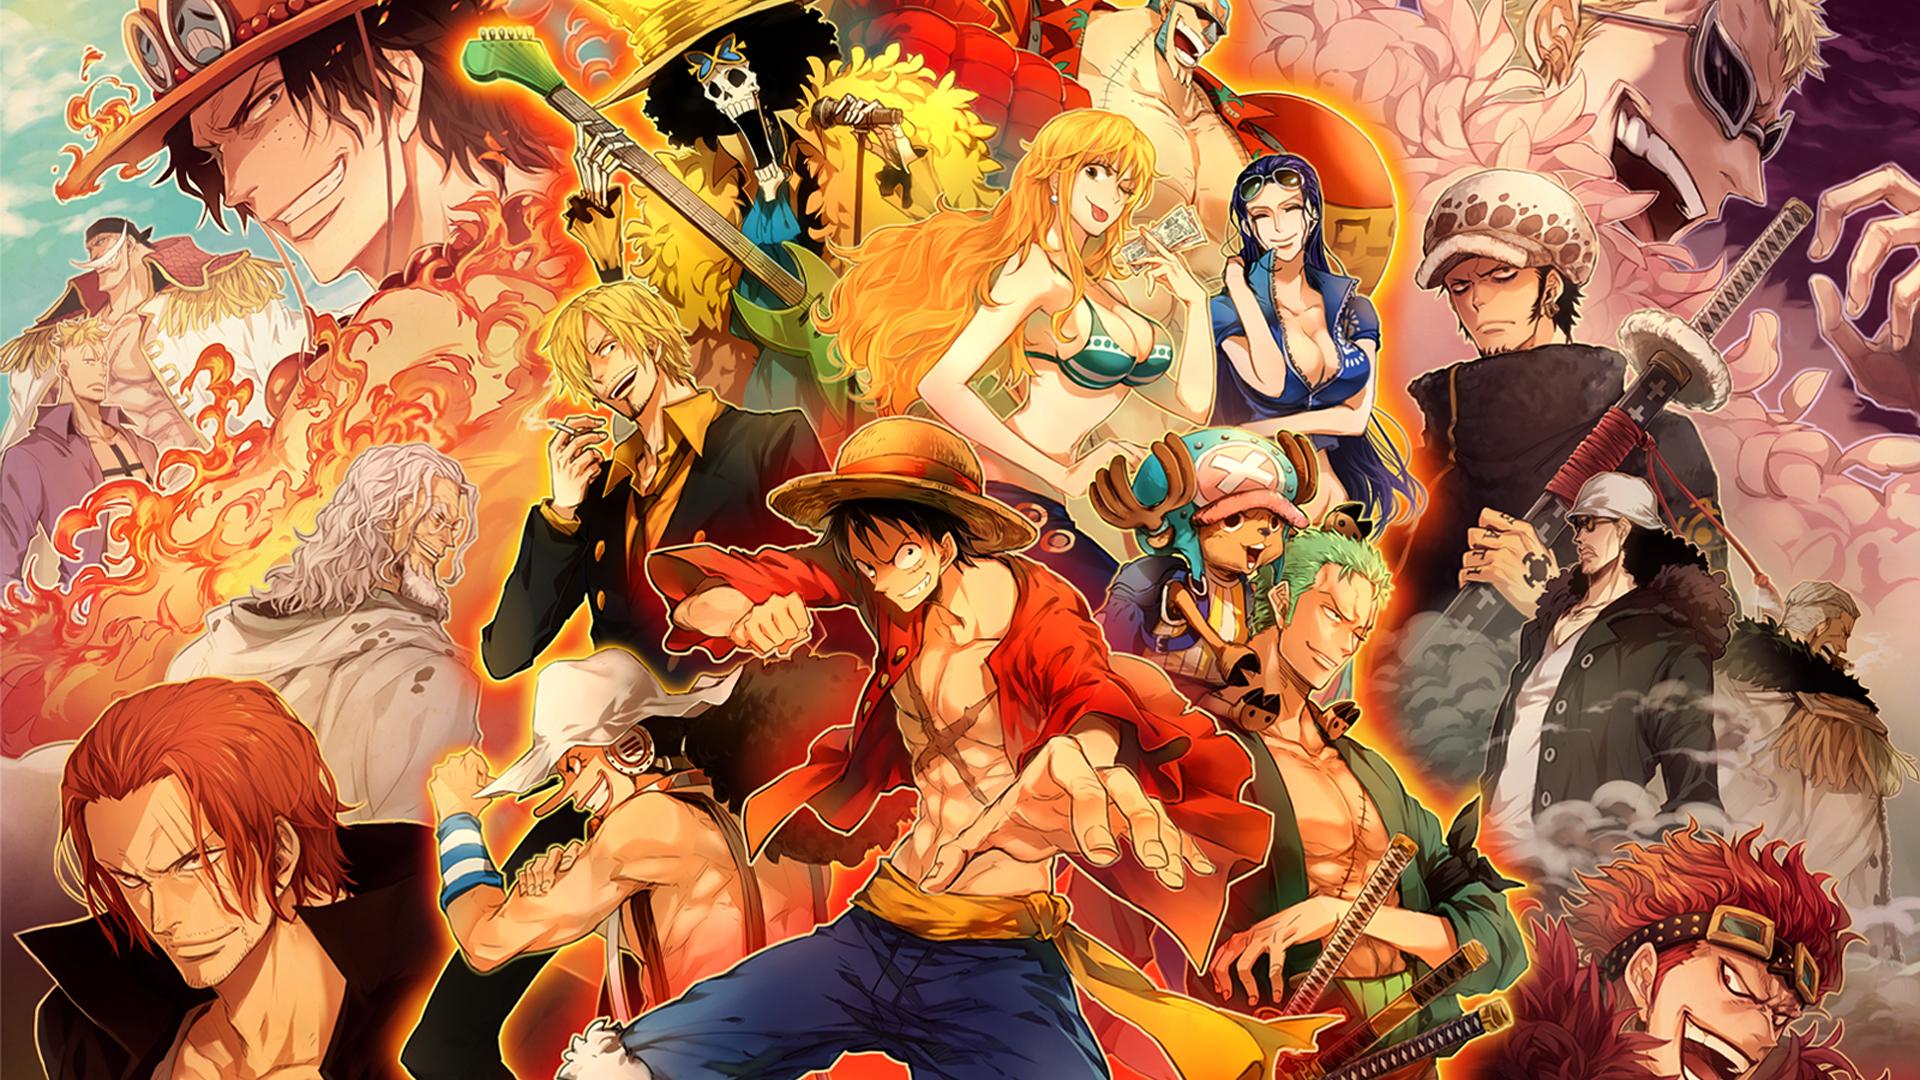 anime one piece wallpaper hd 1920x1080jpg 1920x1080